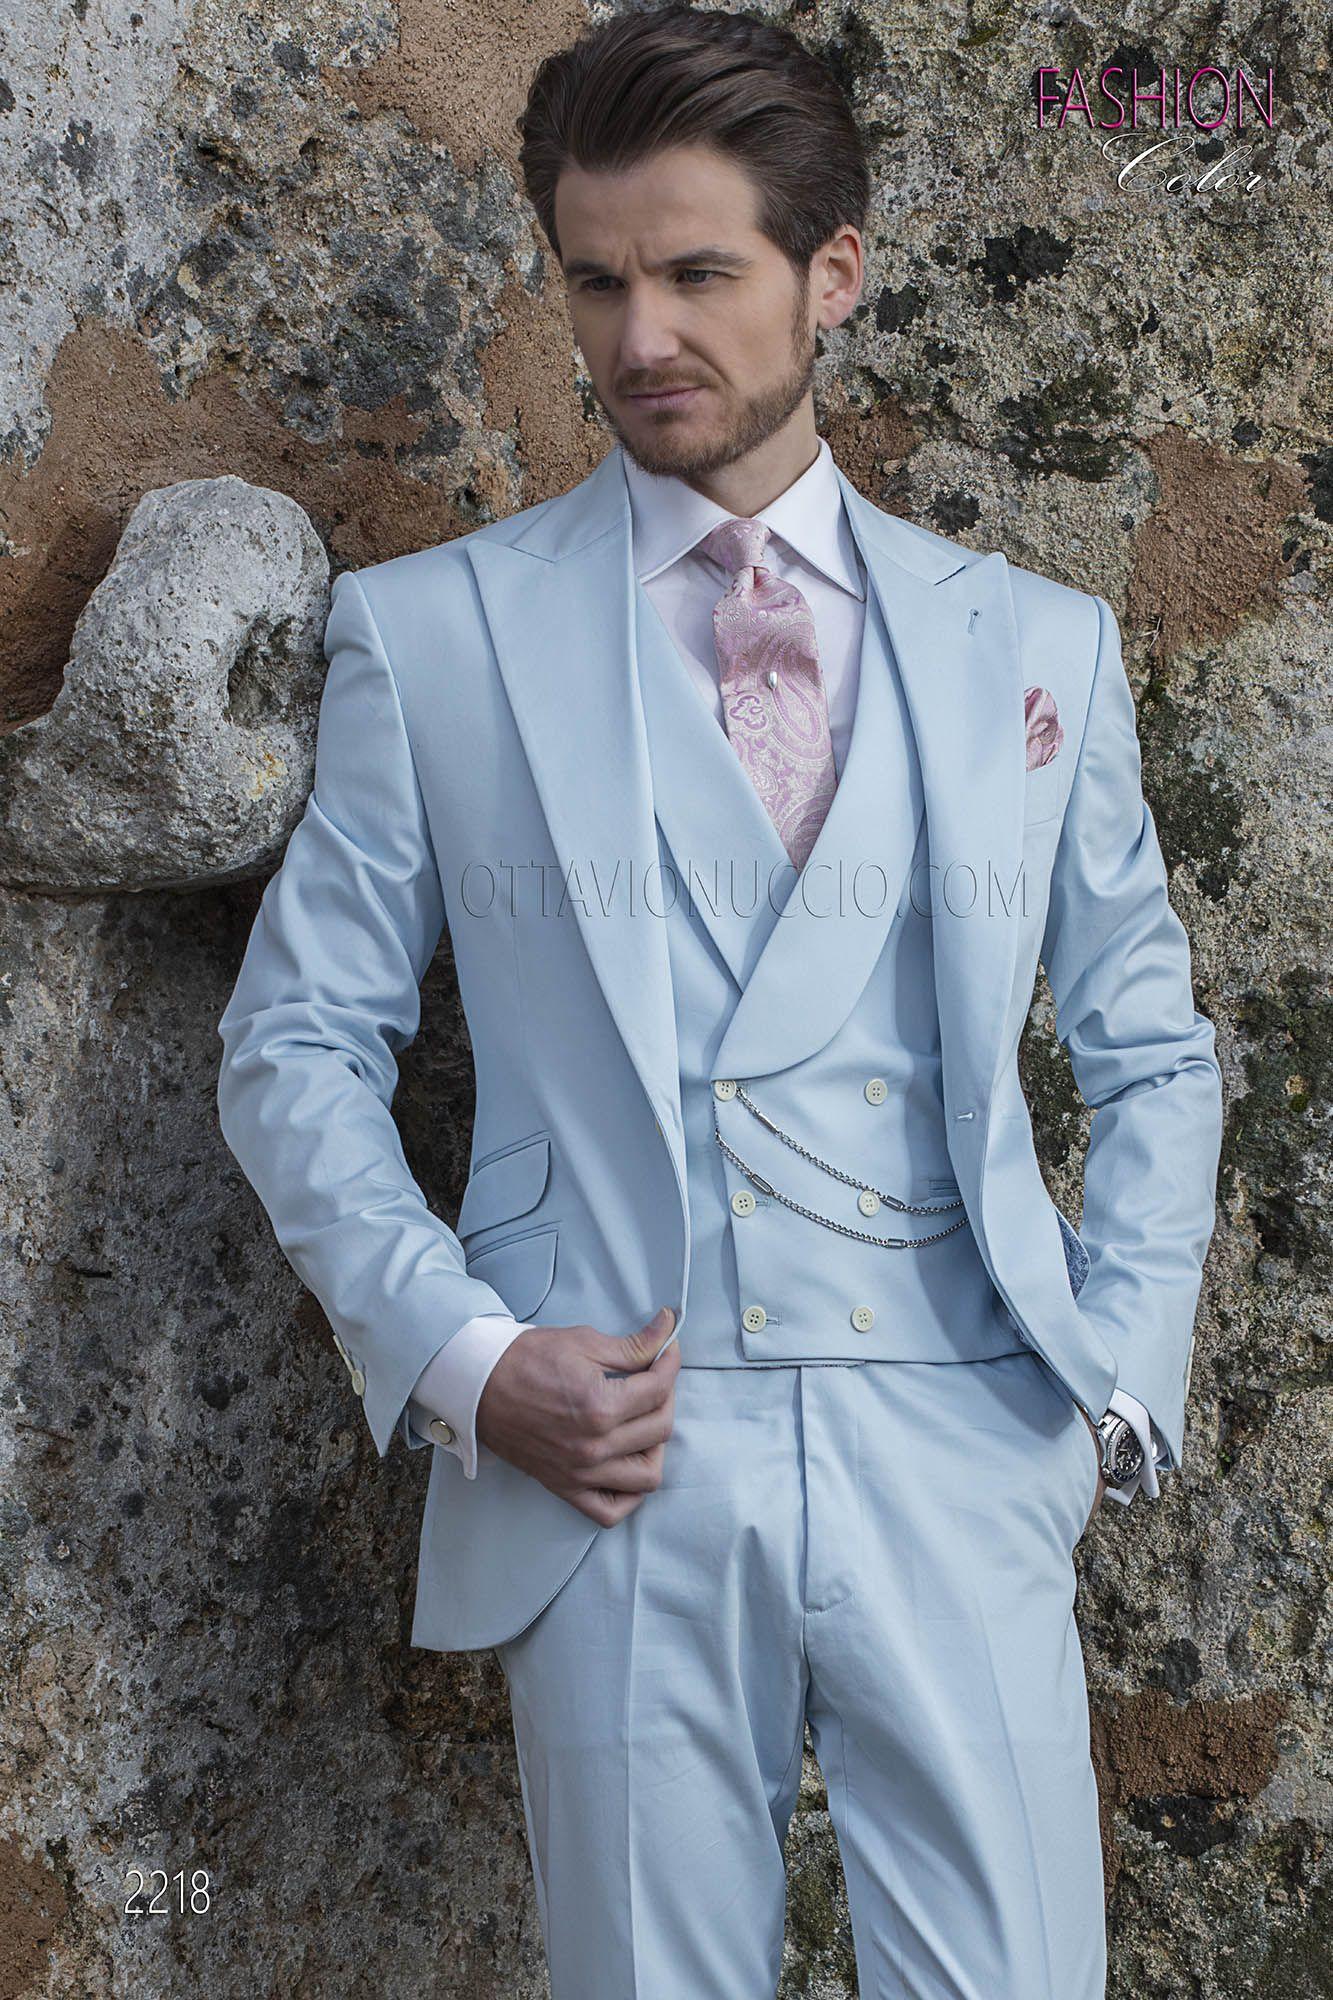 Hipster Matrimonio Uomo : Abito matrimonio uomo vintage moda sposo fashion puro cotone